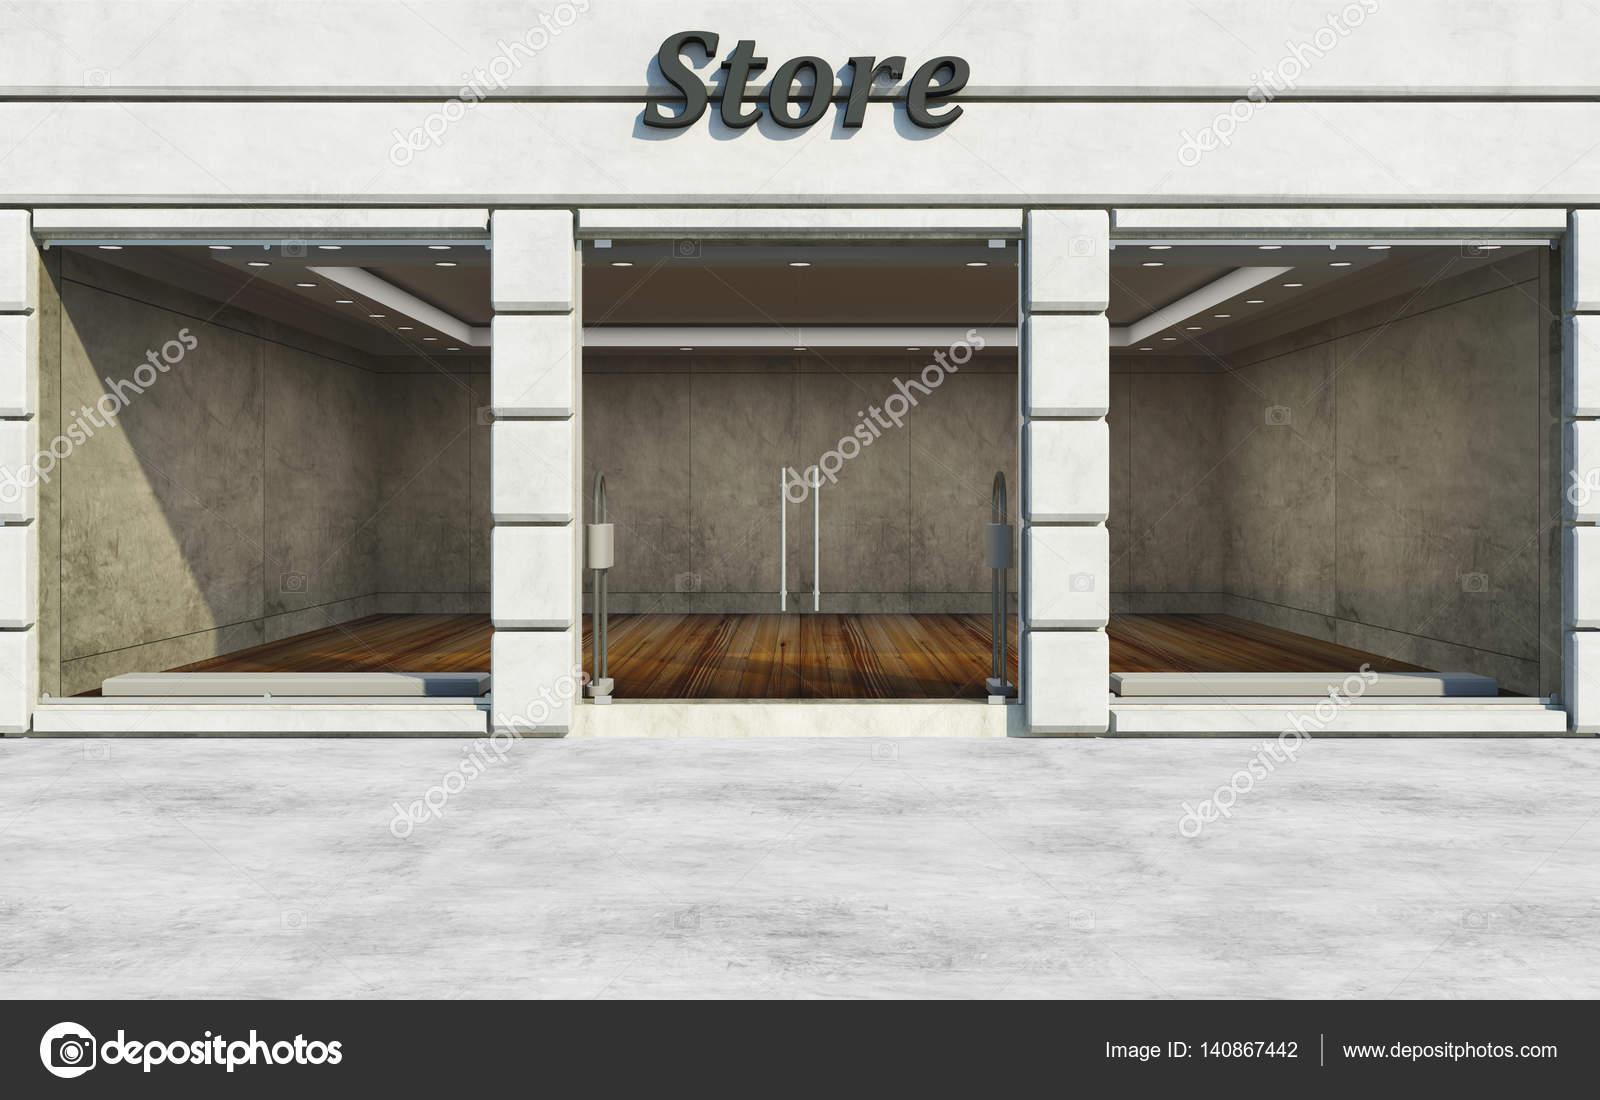 Lege winkel voorkant  Stockfoto  rasslava 140867442